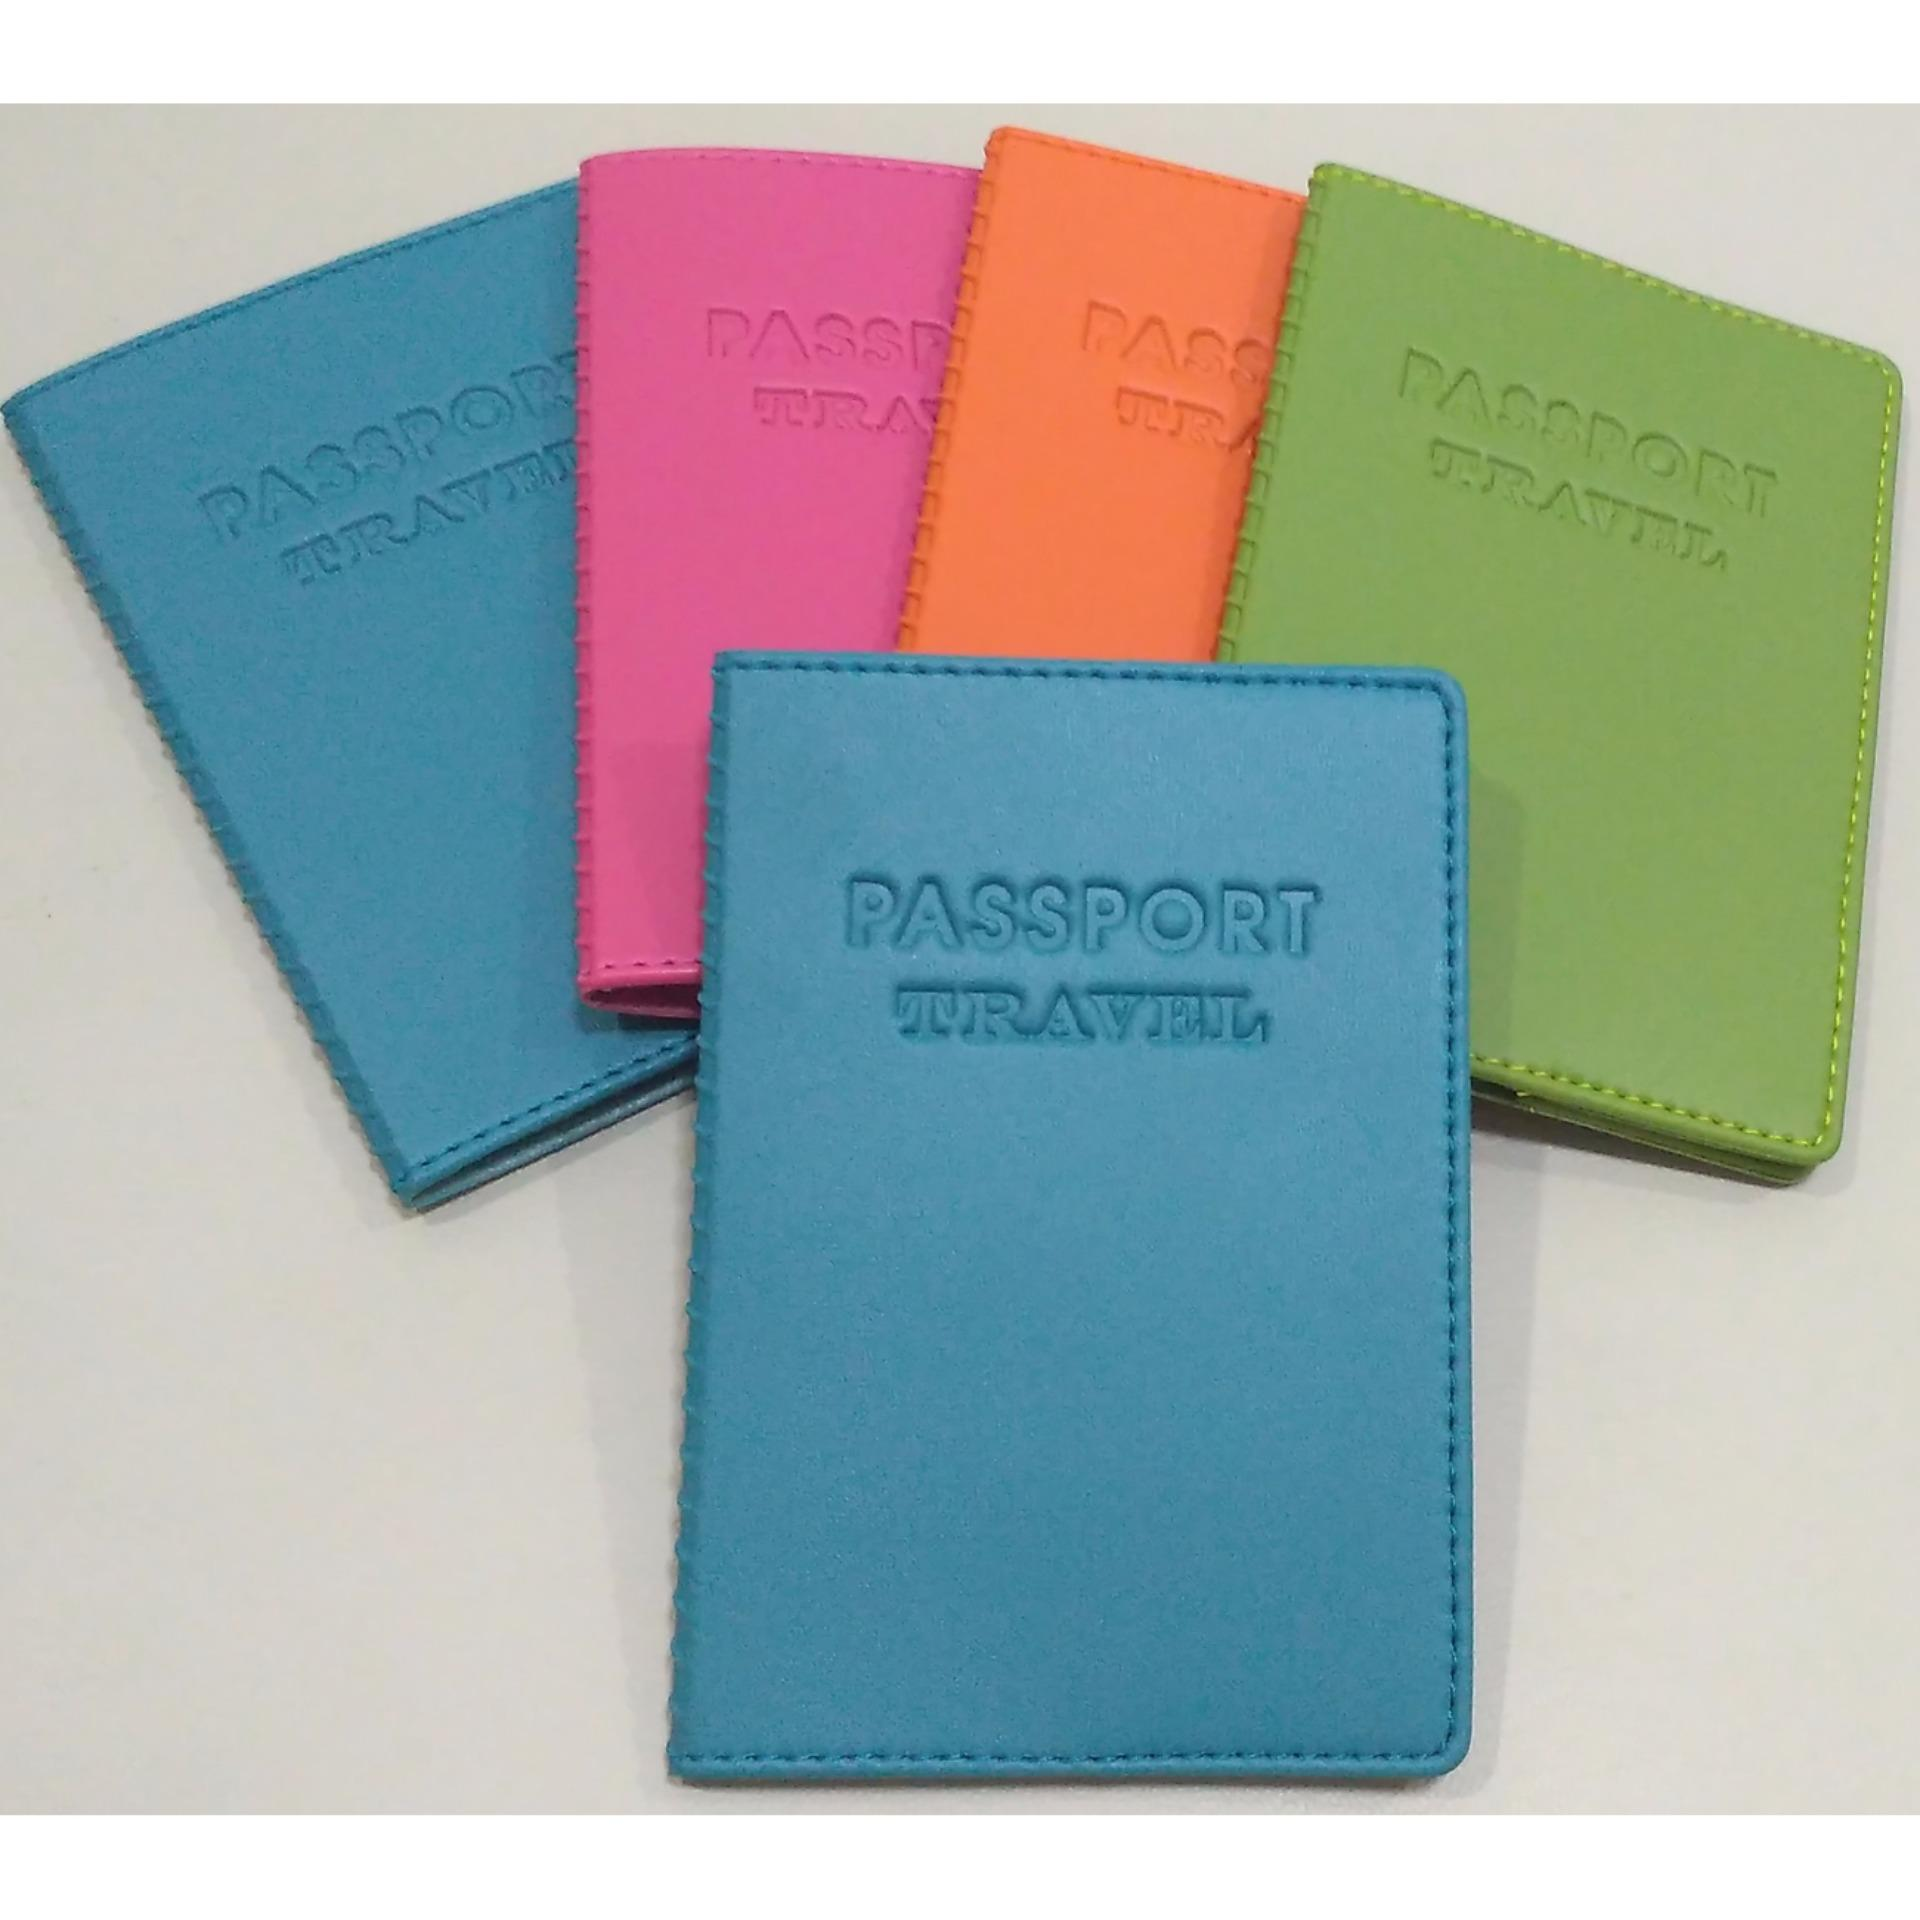 Drenbellony Passport Holder Red Dompet Paspor Cover Tempat Universal Colorful Korea Sampul Biru Source